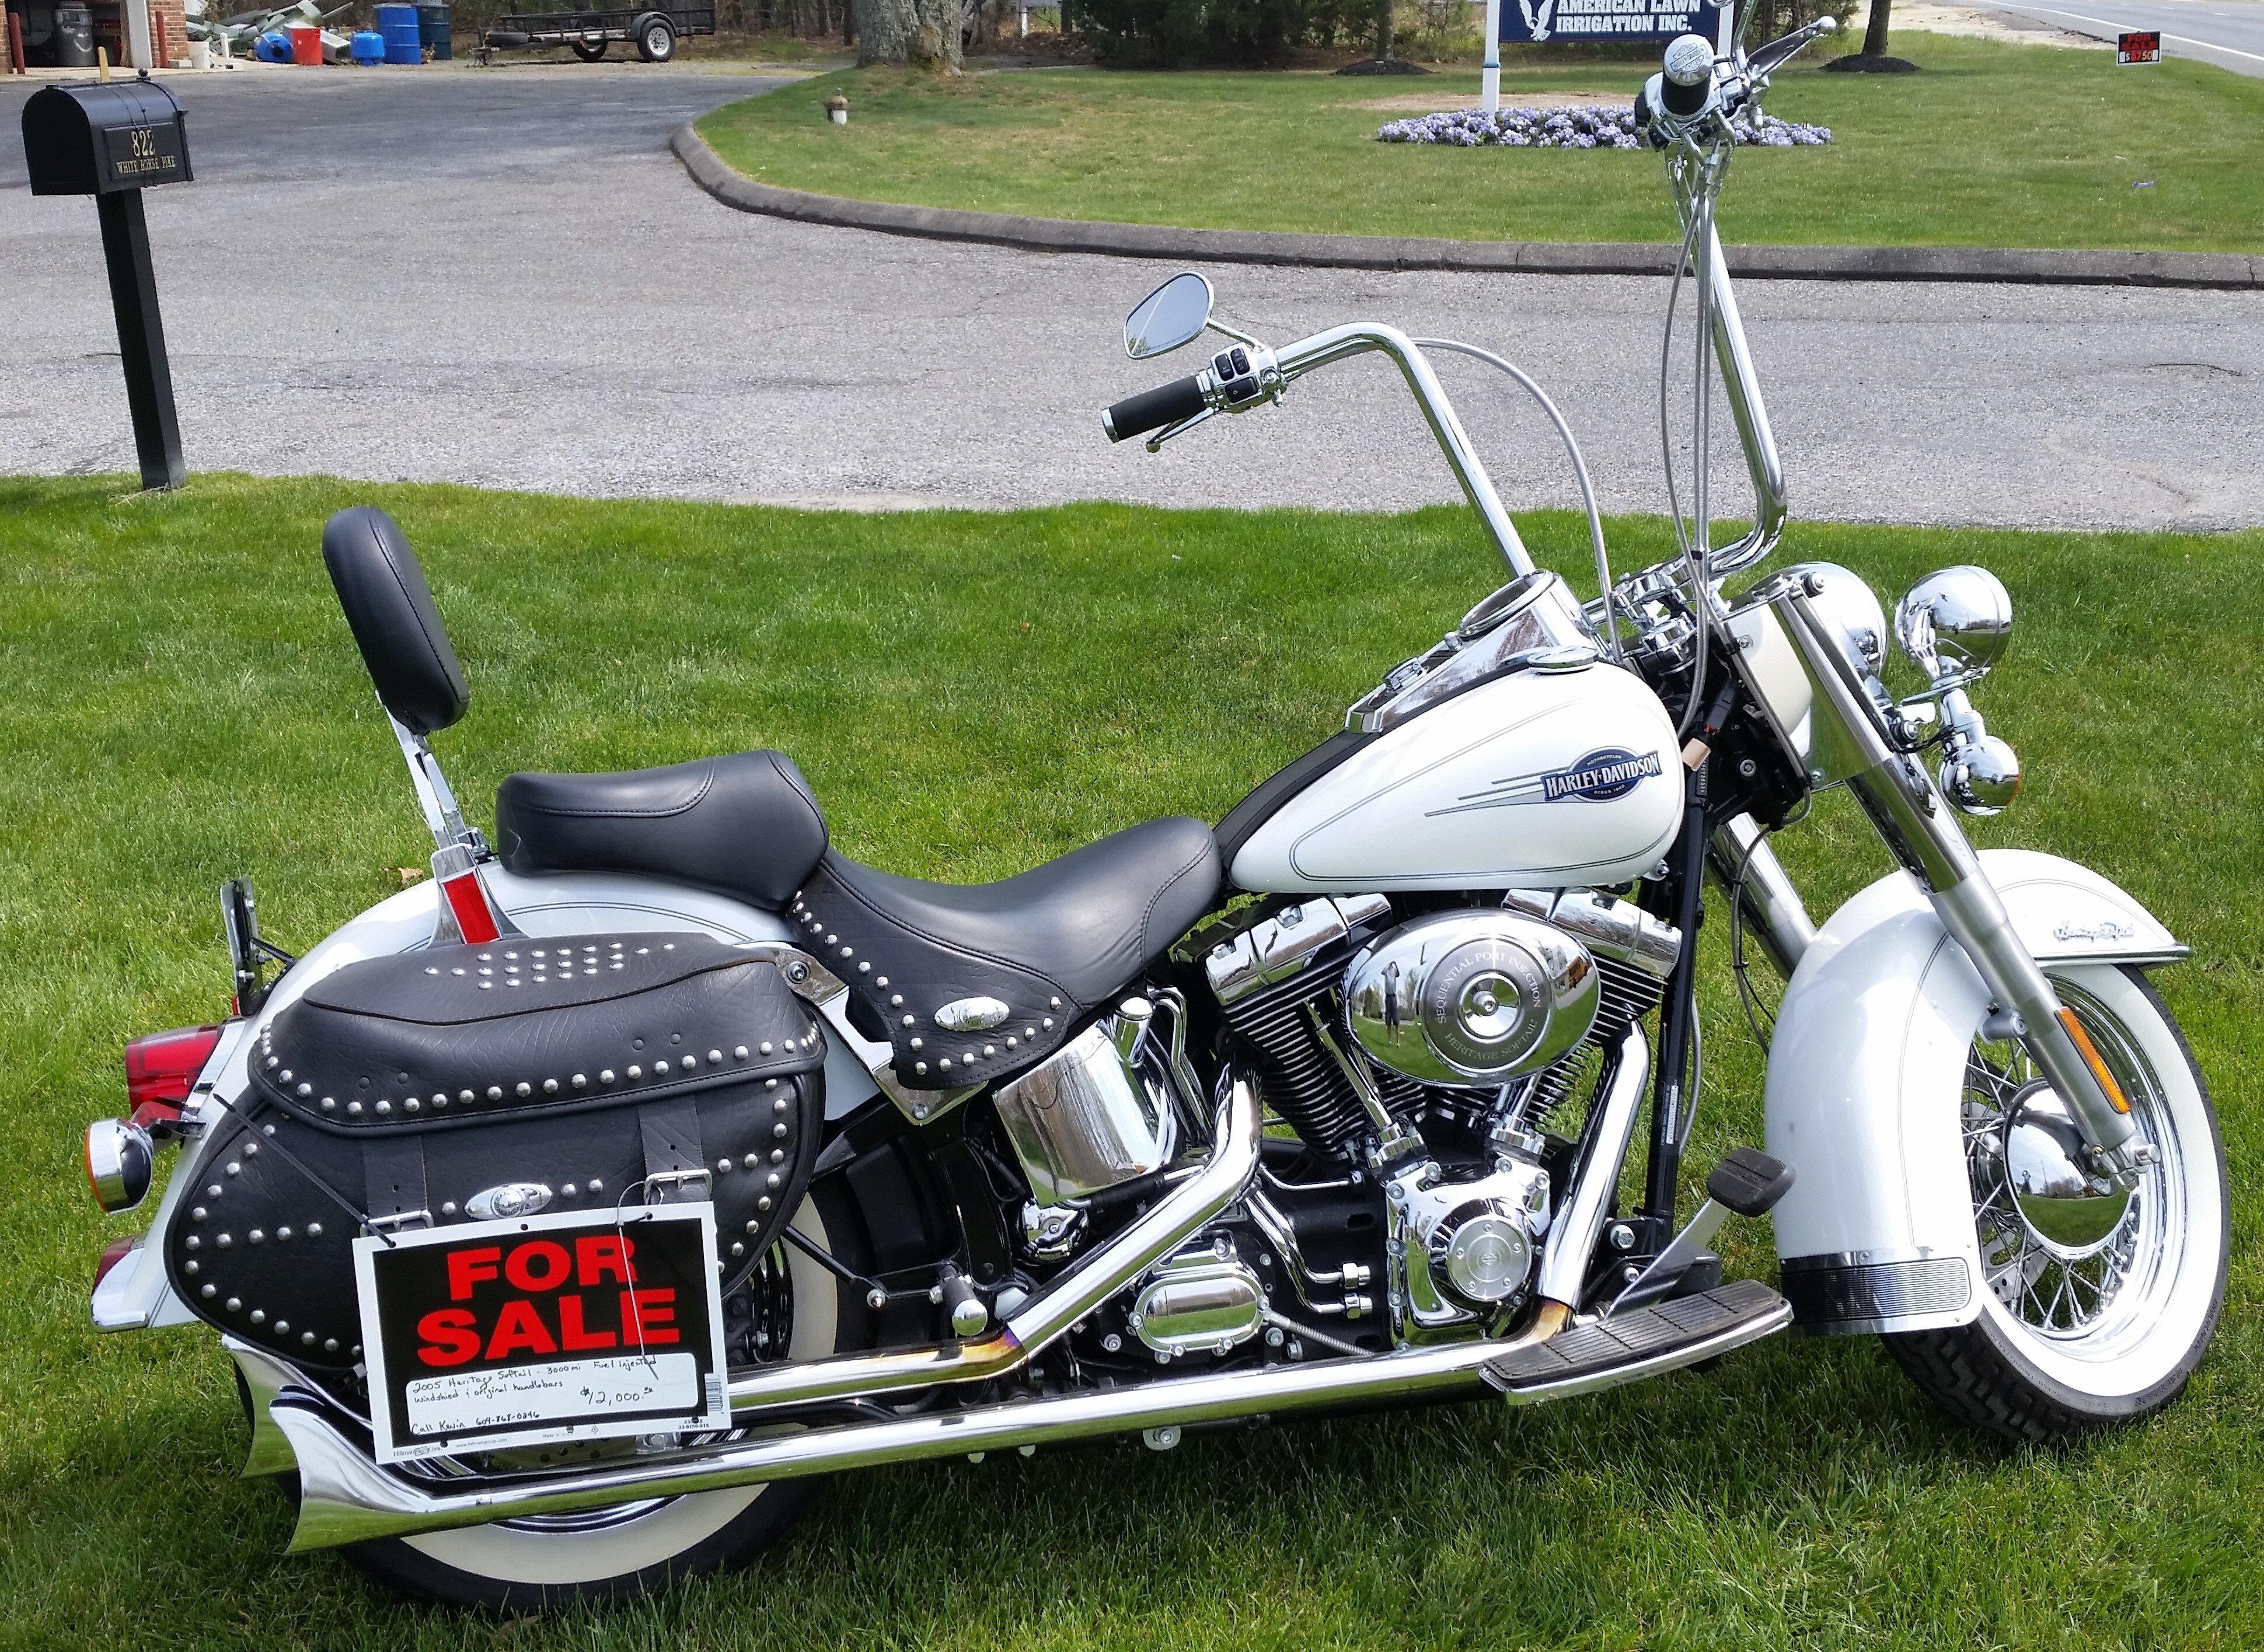 superb craigslist nj motorcycle #5: Good Craigslist Nj Motorcycle #2: 2005-Harley-Davidson-Softail--Motorcycle -200349835-256103889e20b30d9b4ed5fdca2c99e1.jpg?wu003d1280